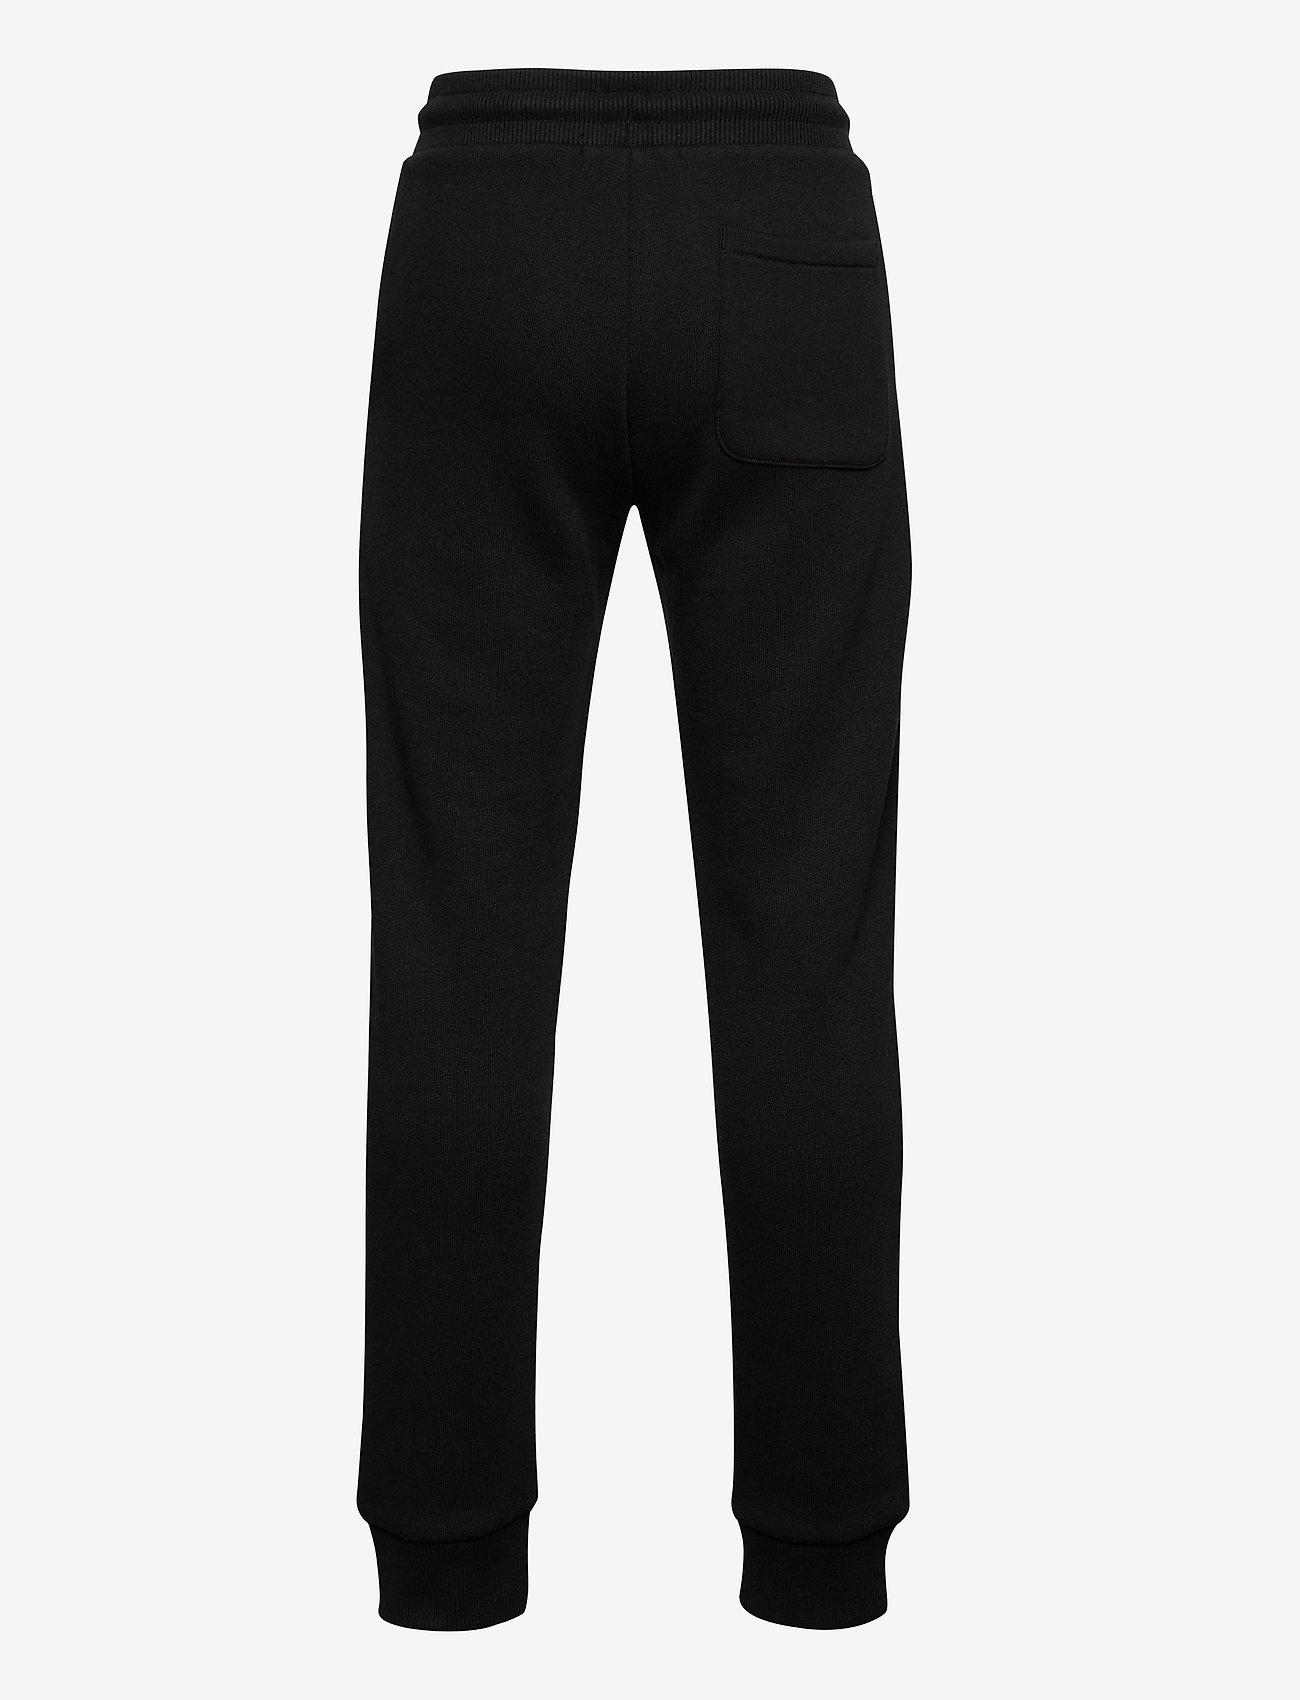 Calvin Klein - MONOGRAM SWEATPANTS - joggingbroek - ck black - 1